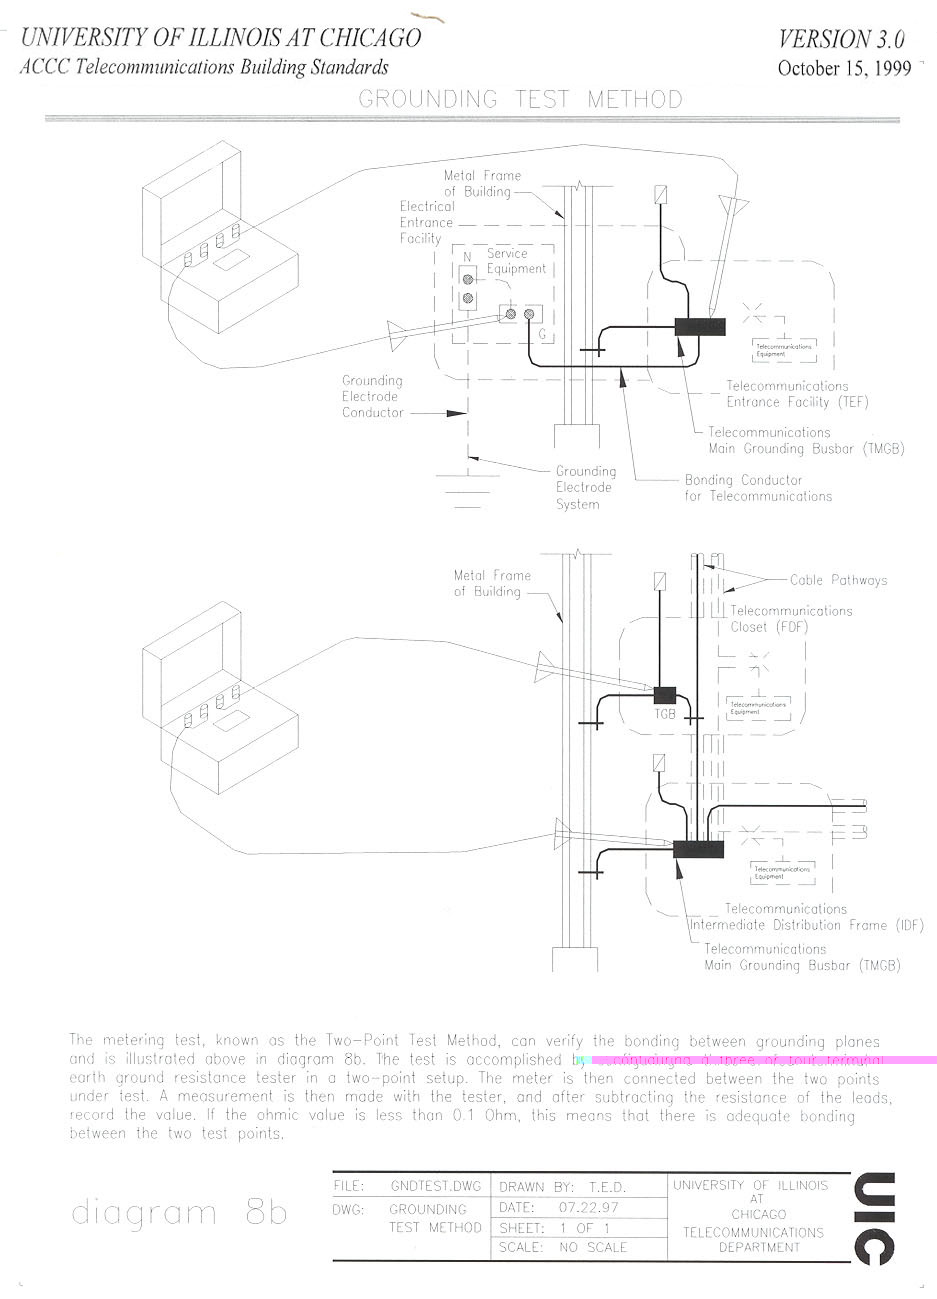 08 diagram 8b index of assets files downloads telecom standards